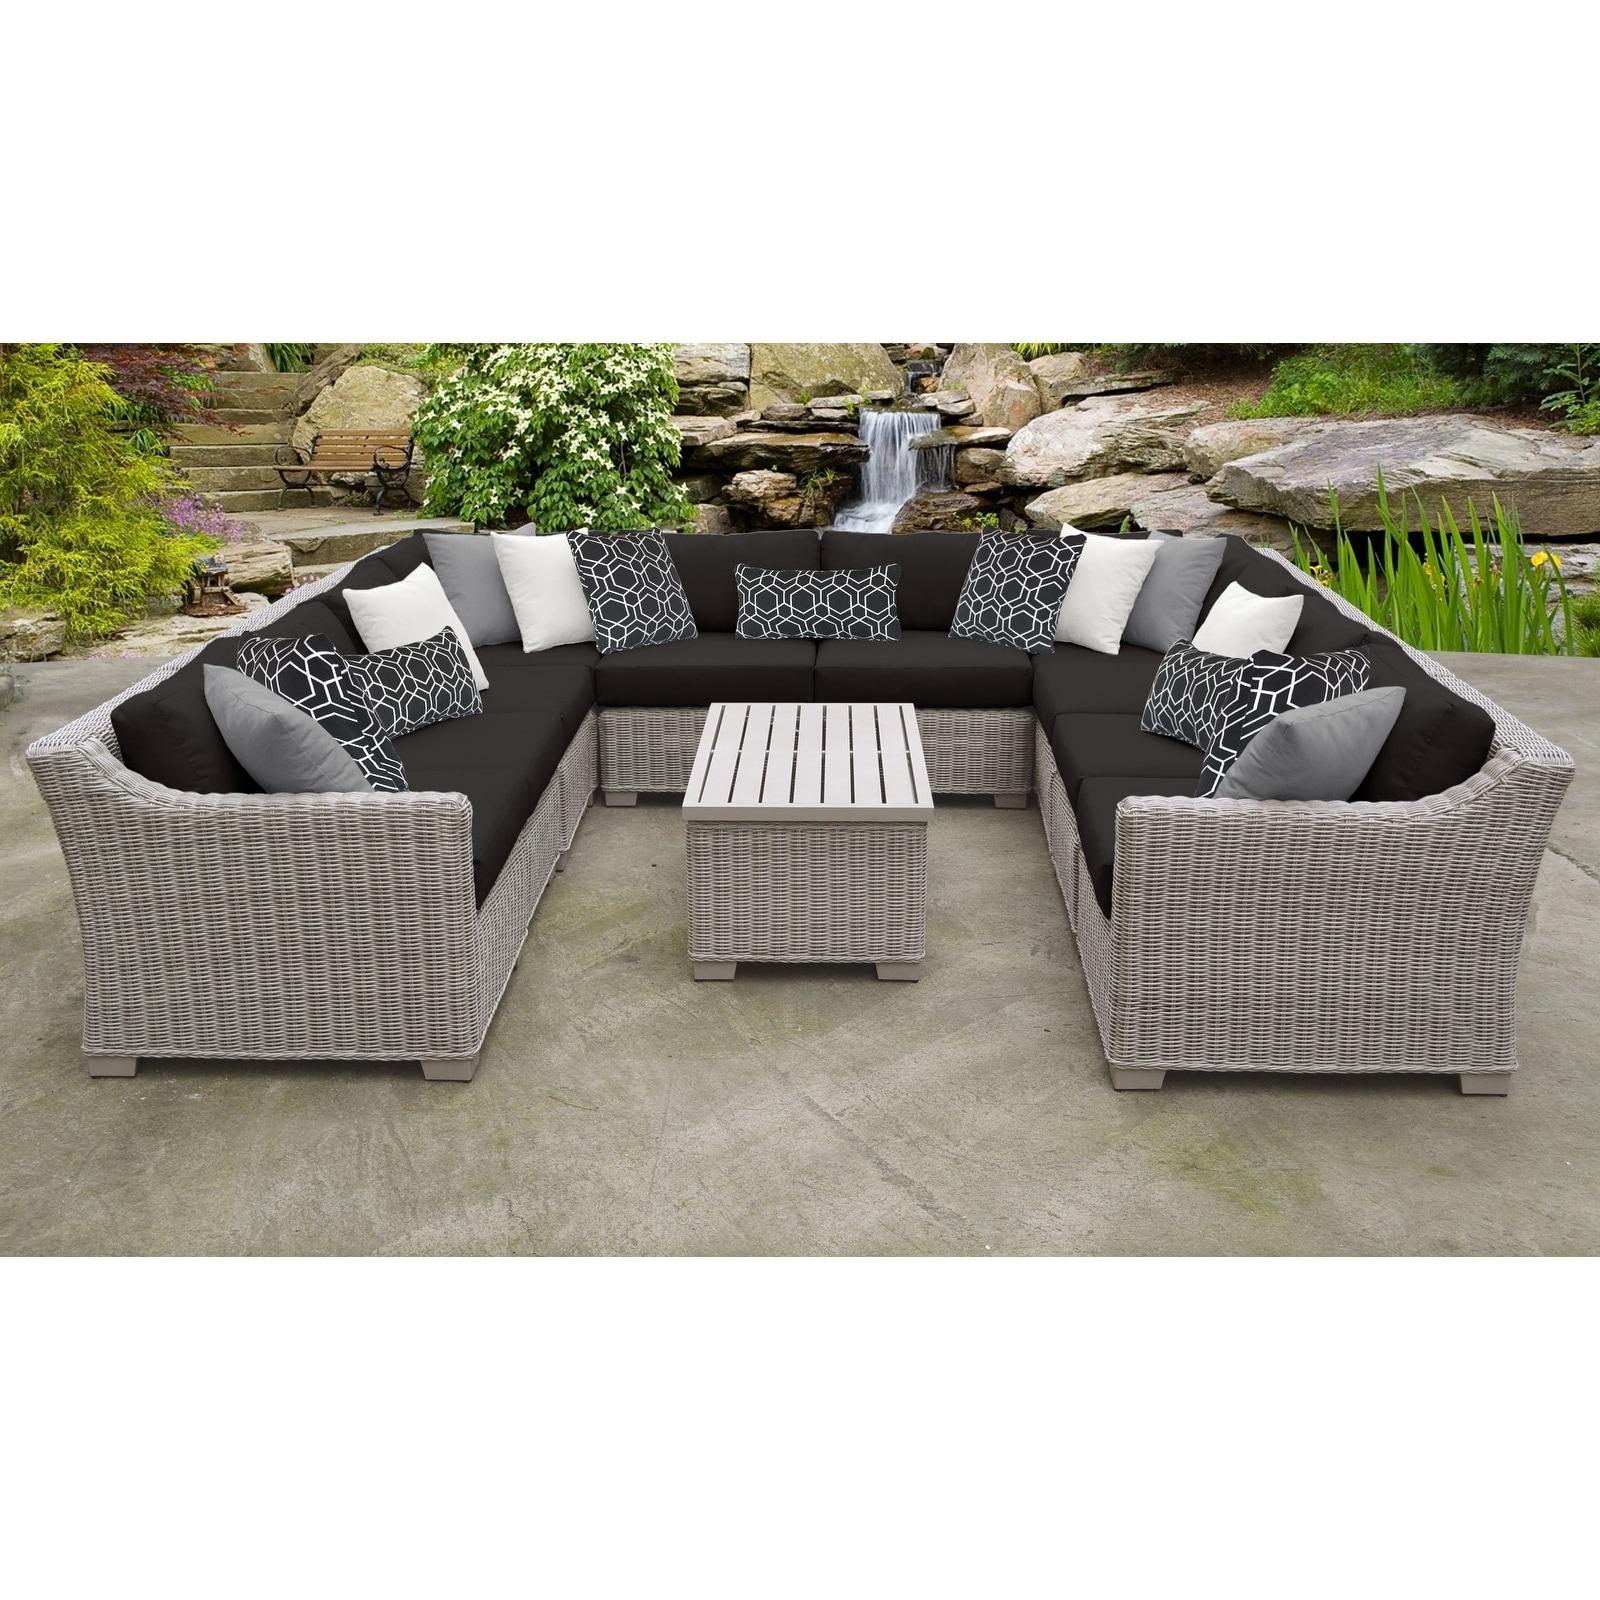 Outdoor Wicker Patio Furniture Set 11a